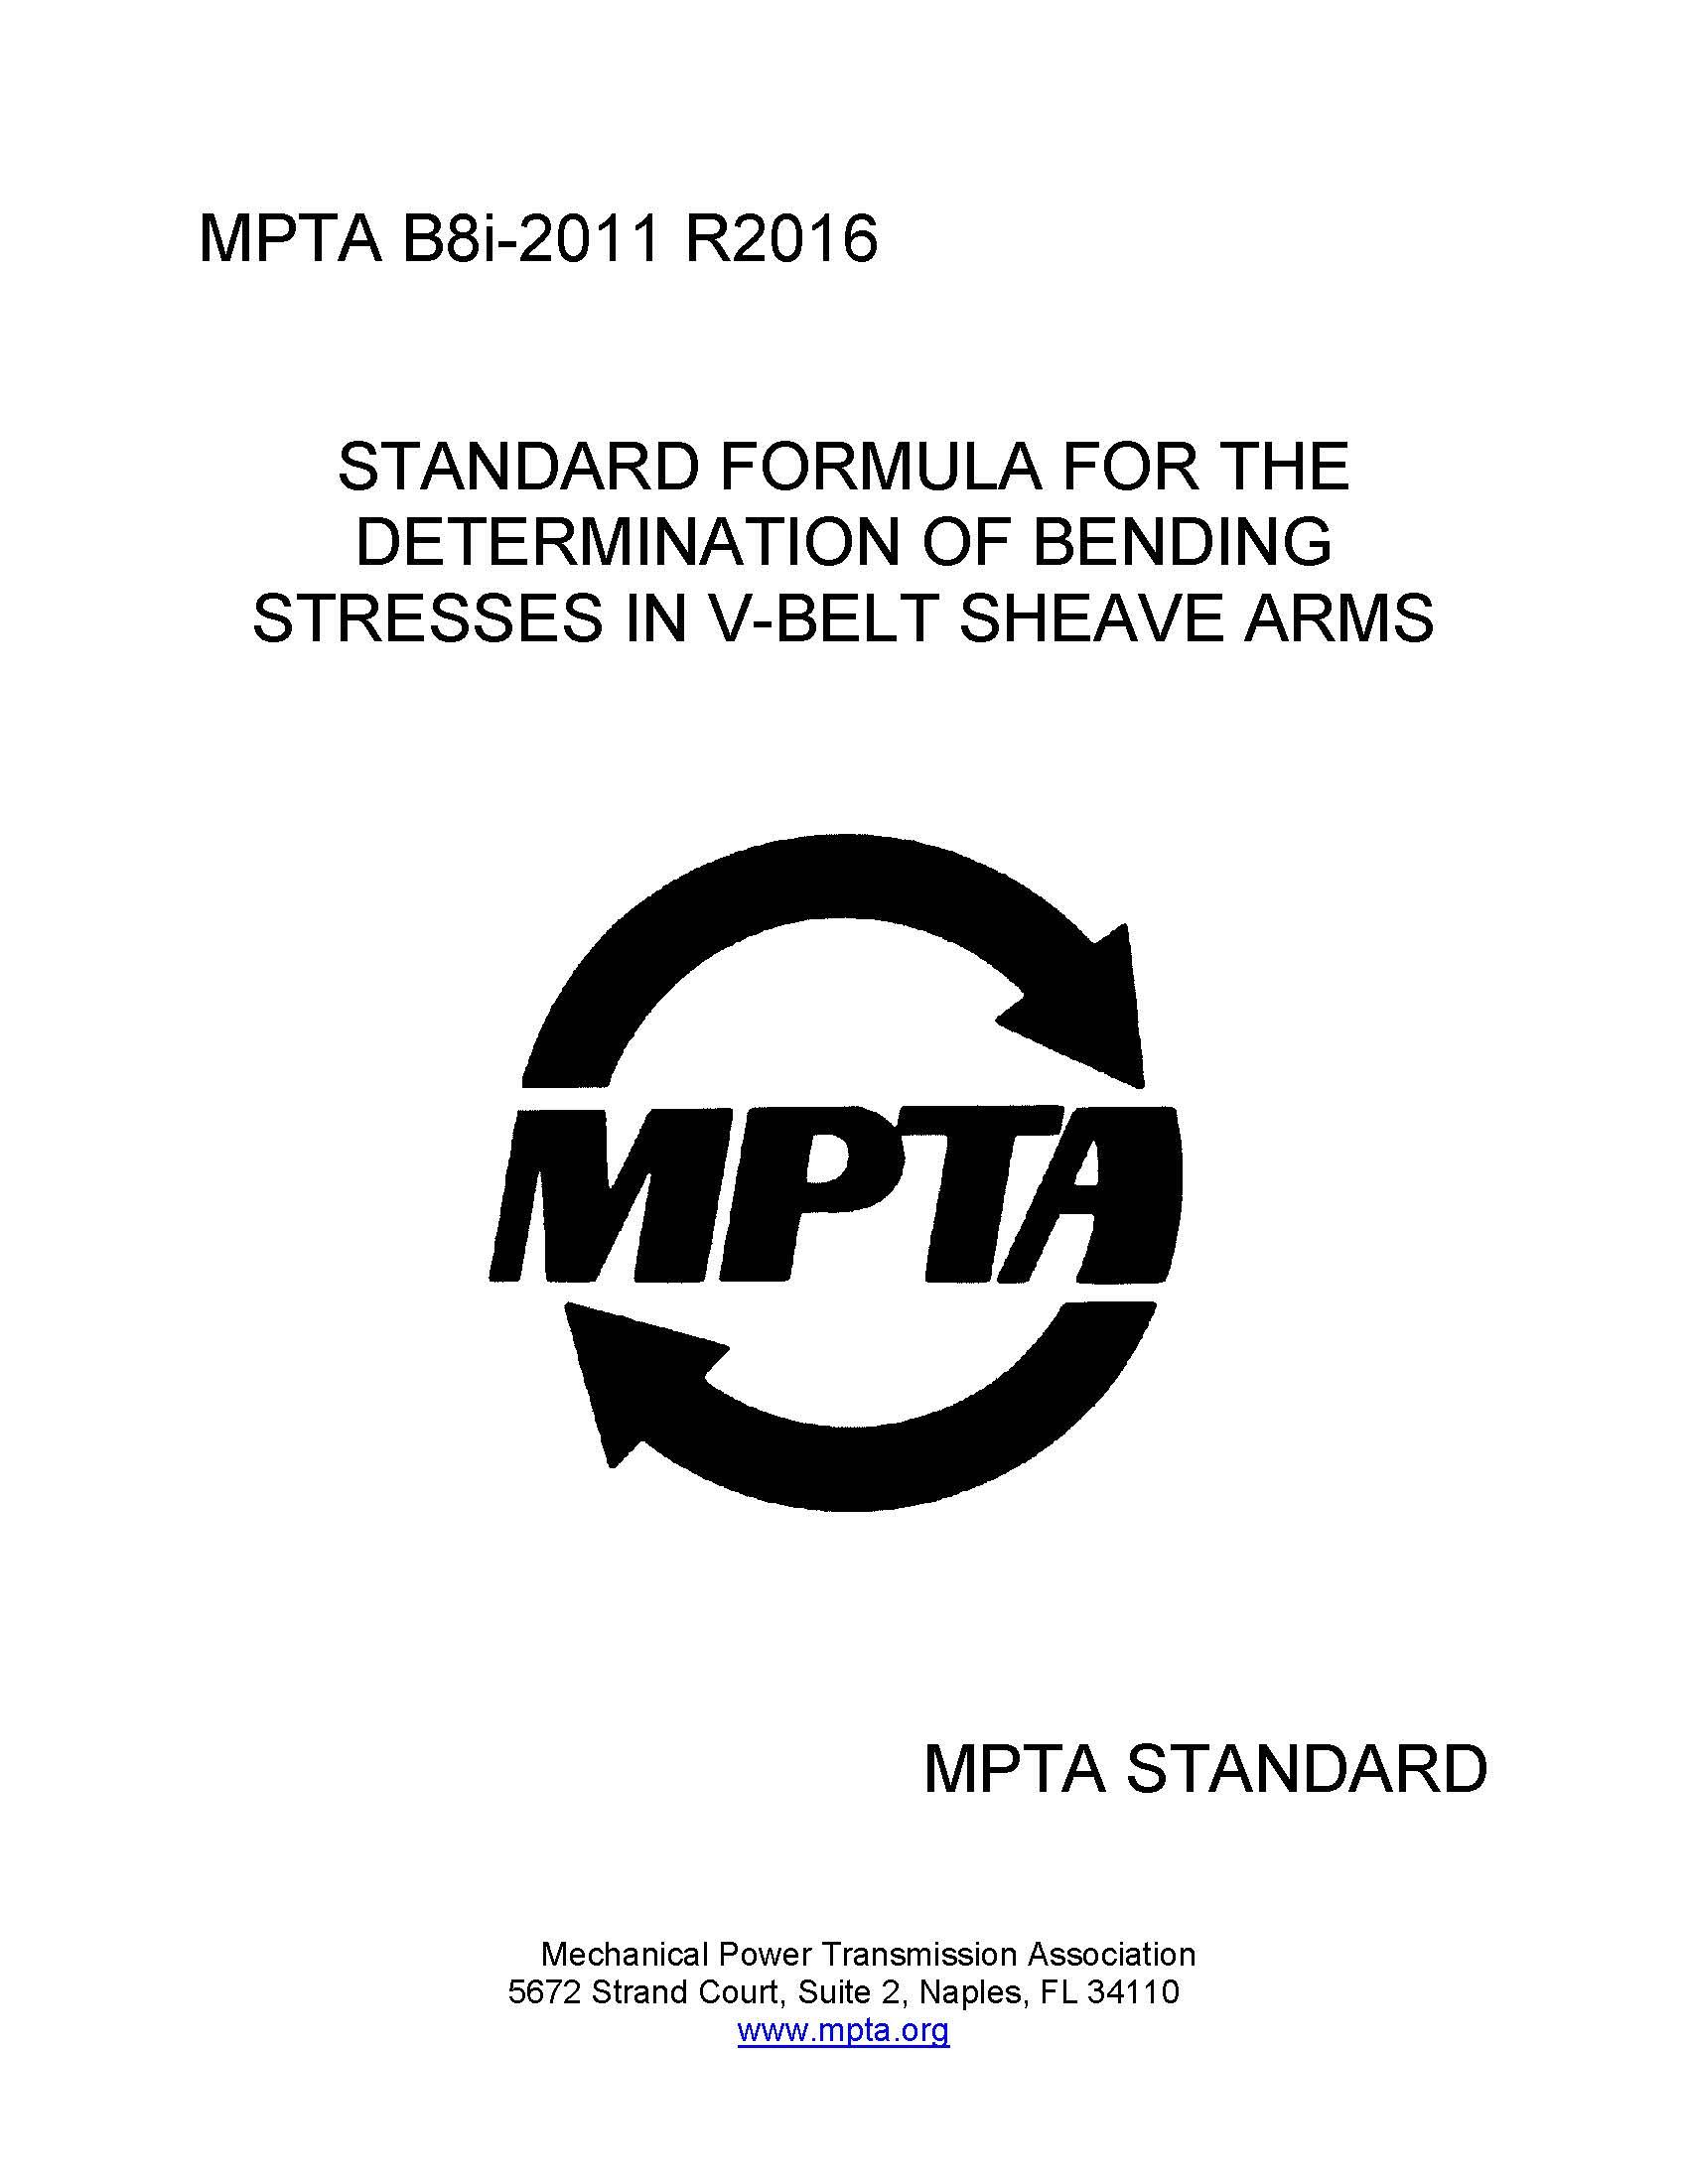 An image of the MPTA standard B8i, Standard Formula for the Determination of Bending stresses in V-Belt Sheave Arms.